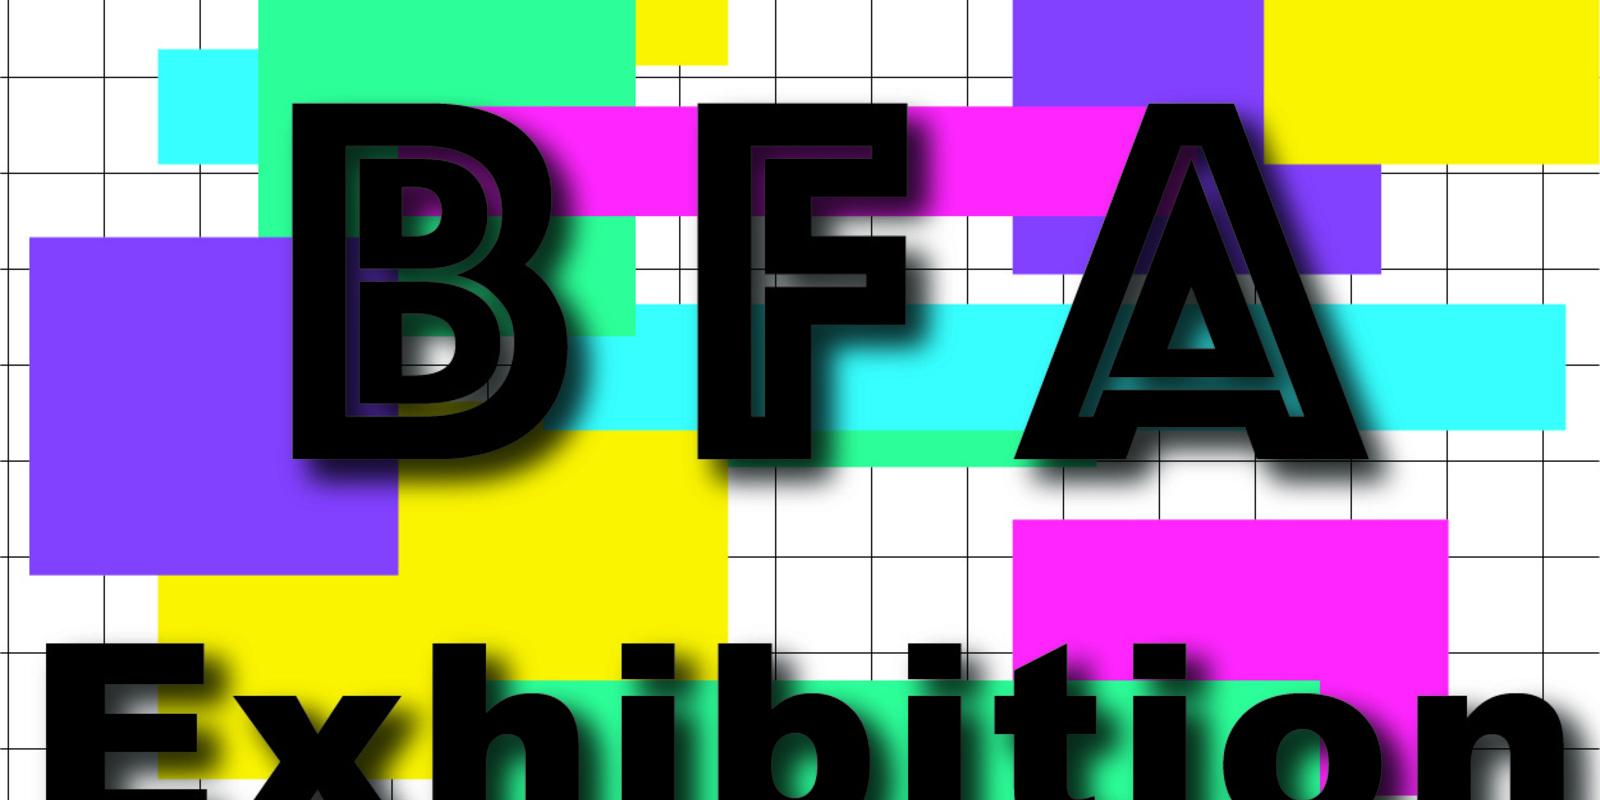 Event showcase image